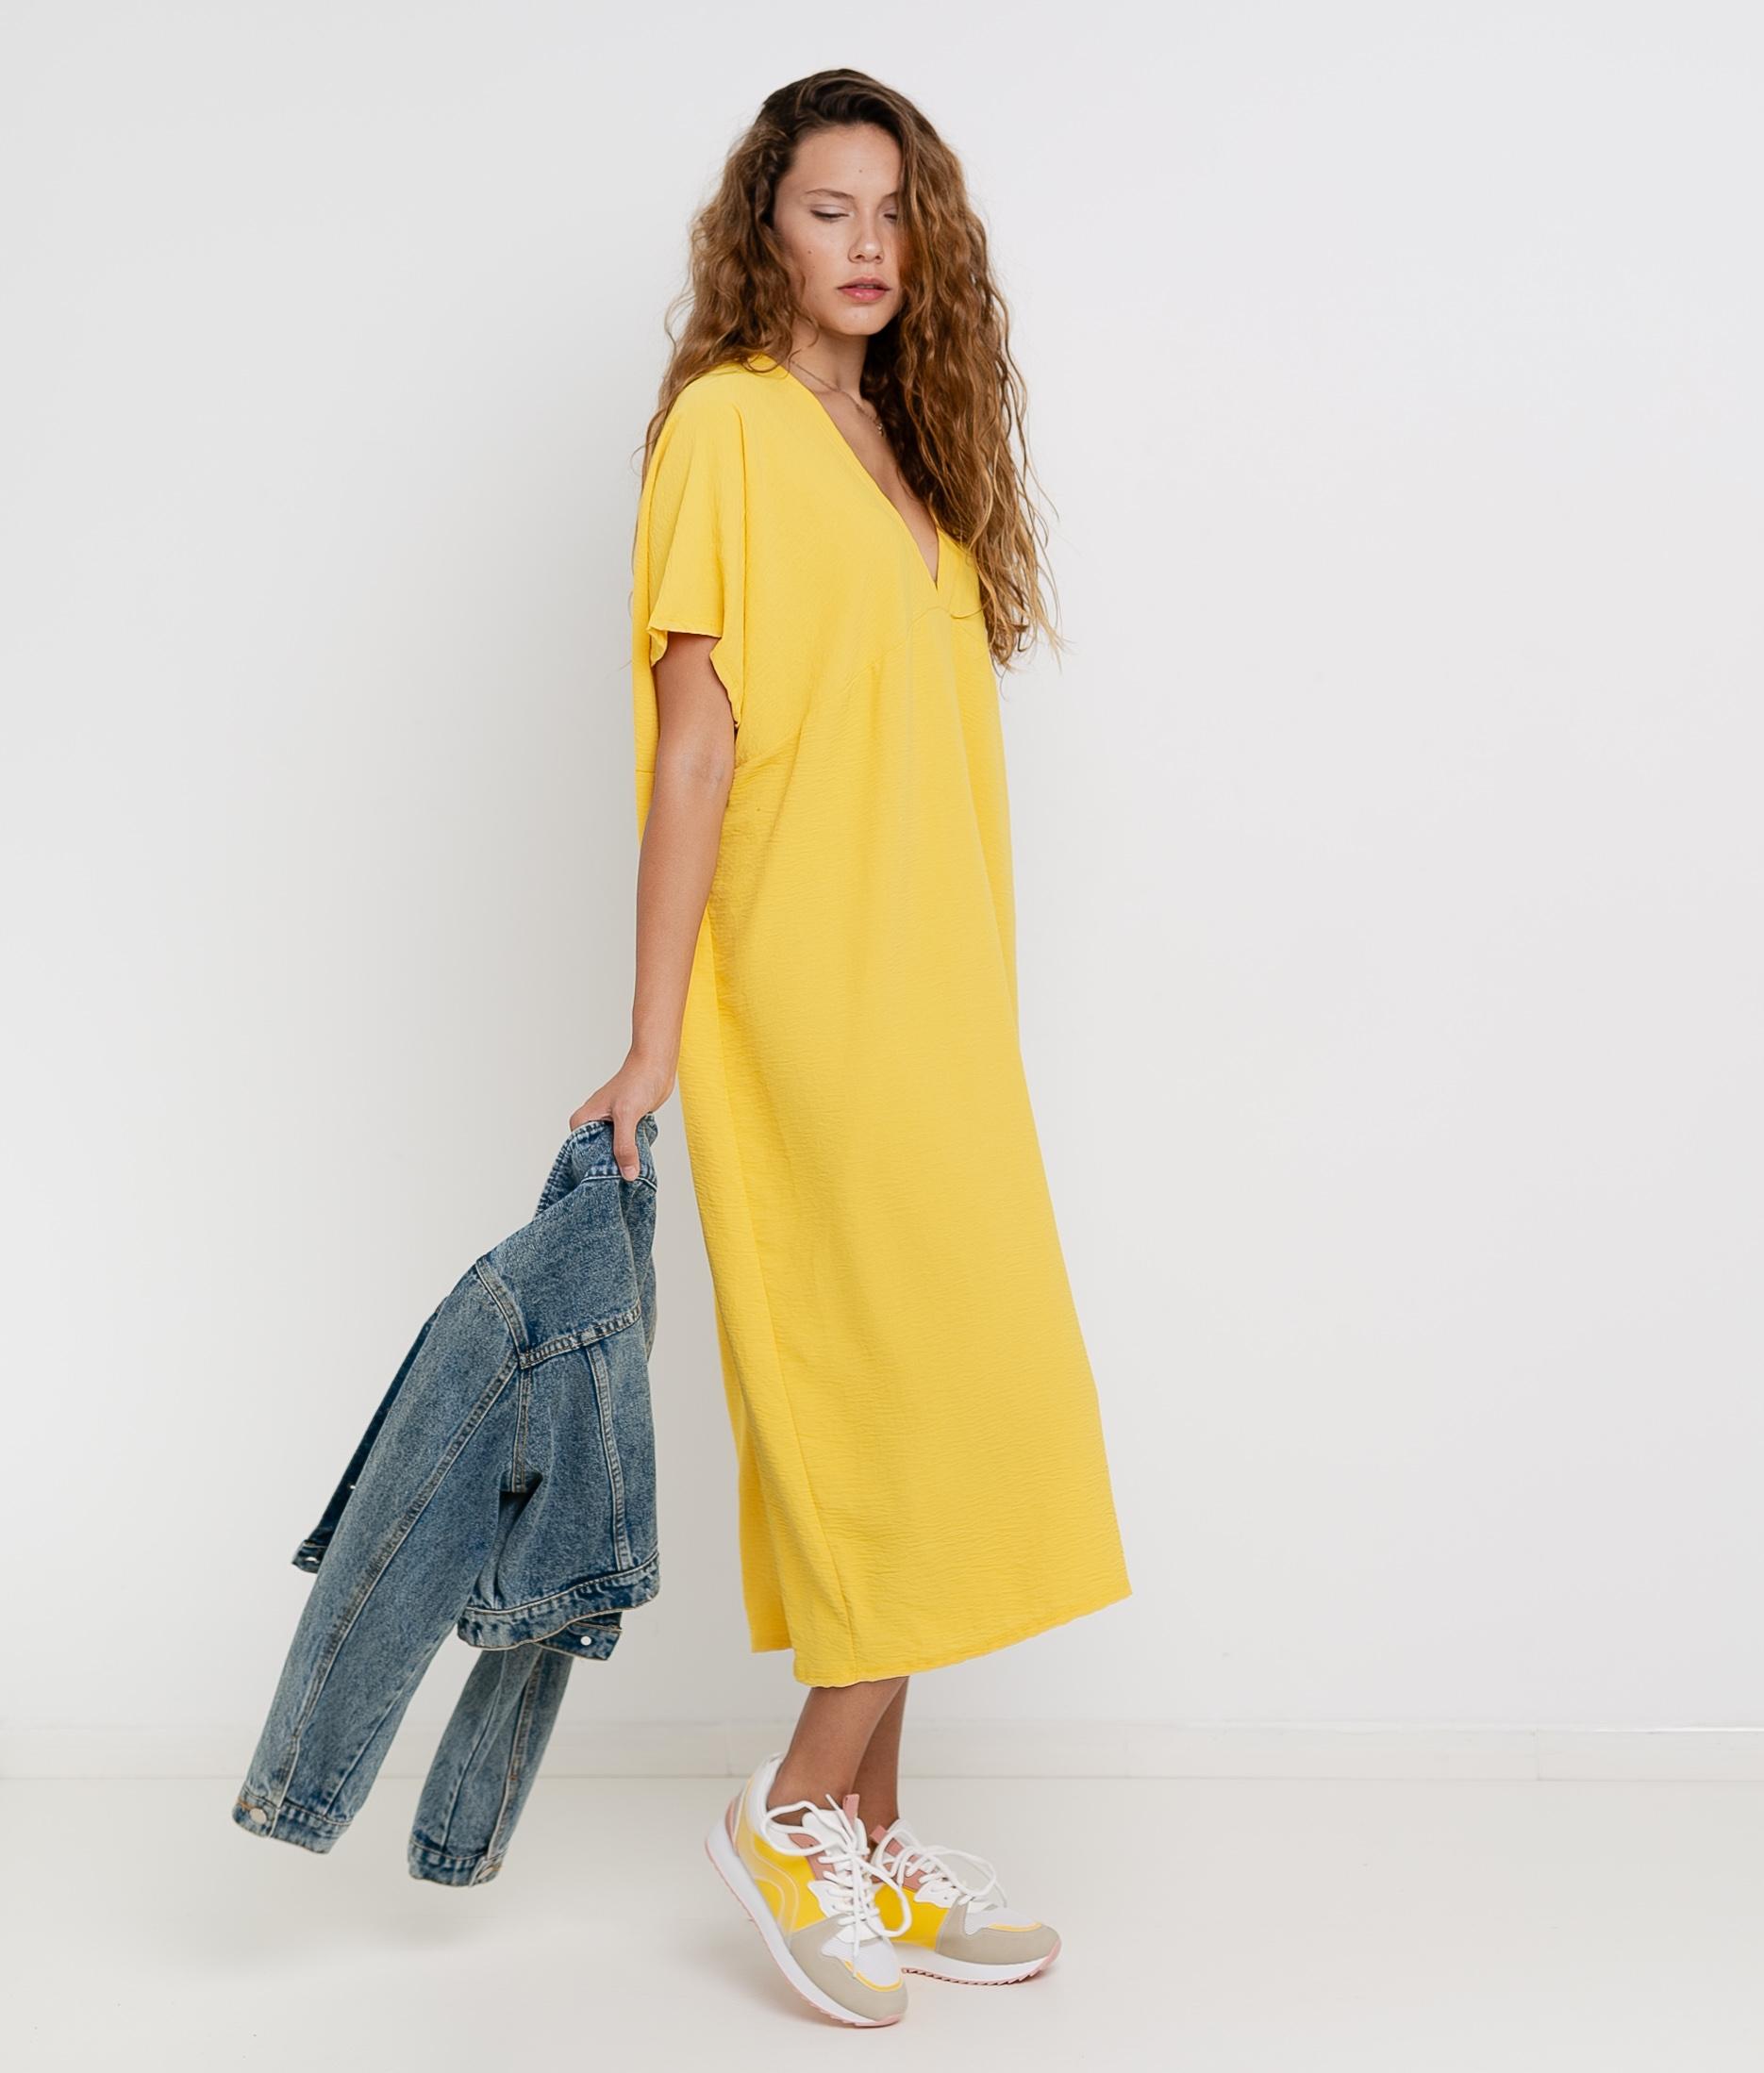 Vestido Luba - Amarelo